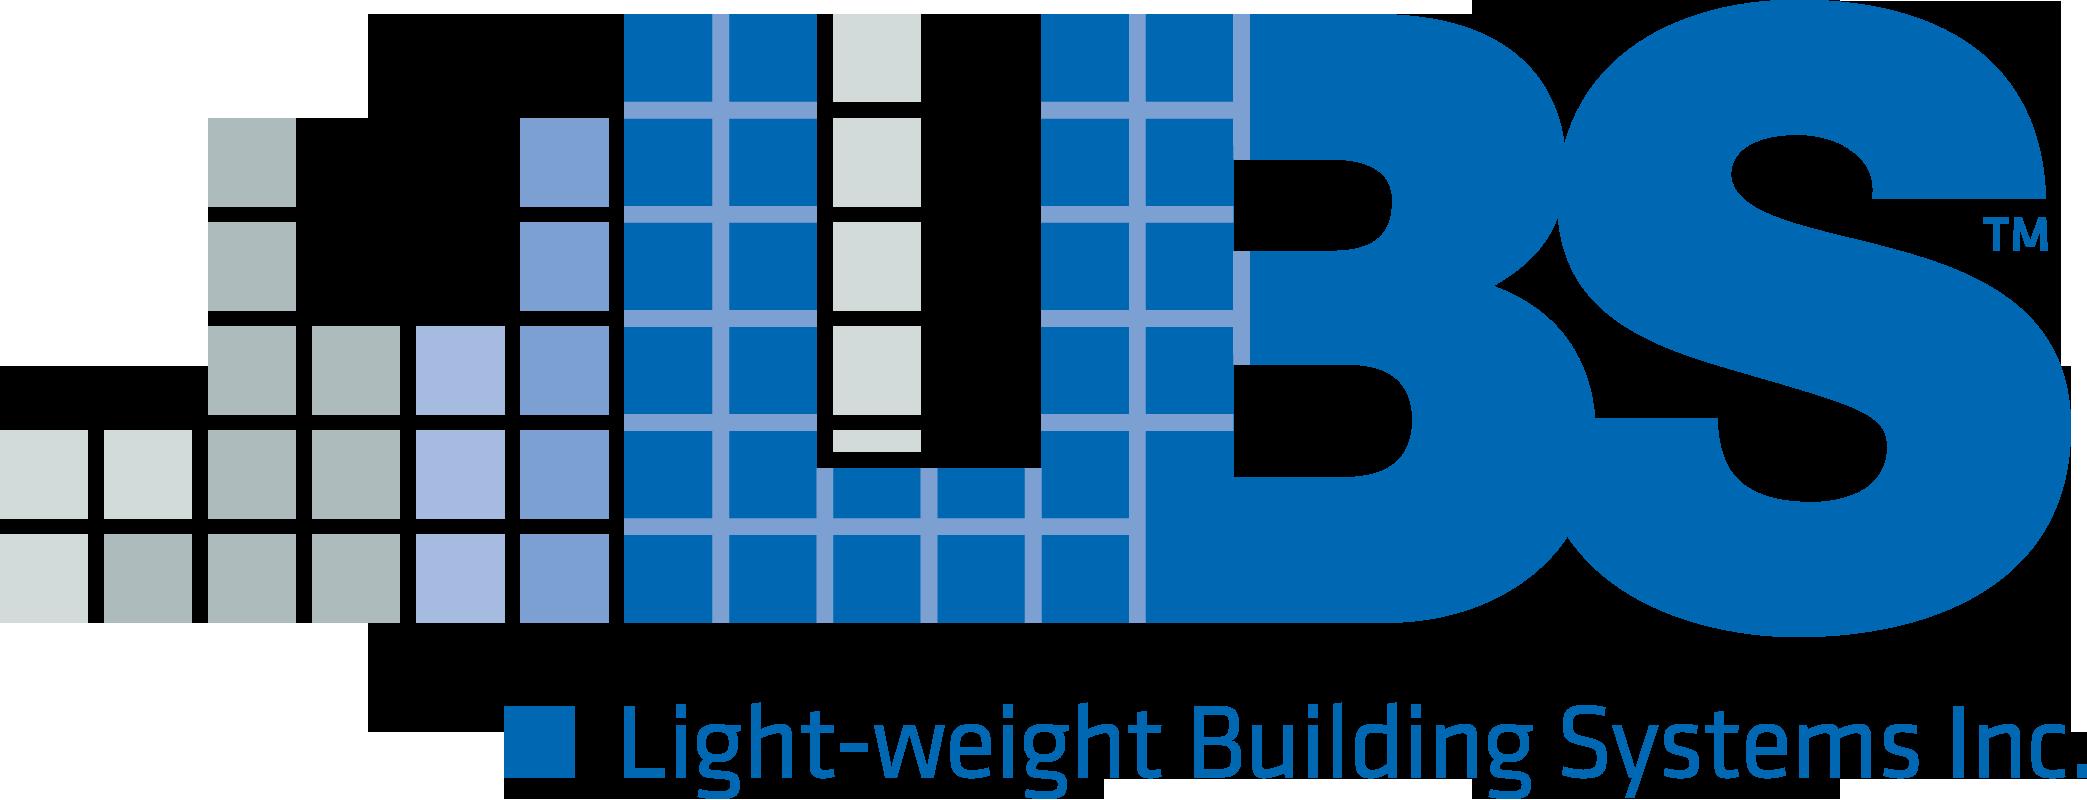 LWBSI Logo